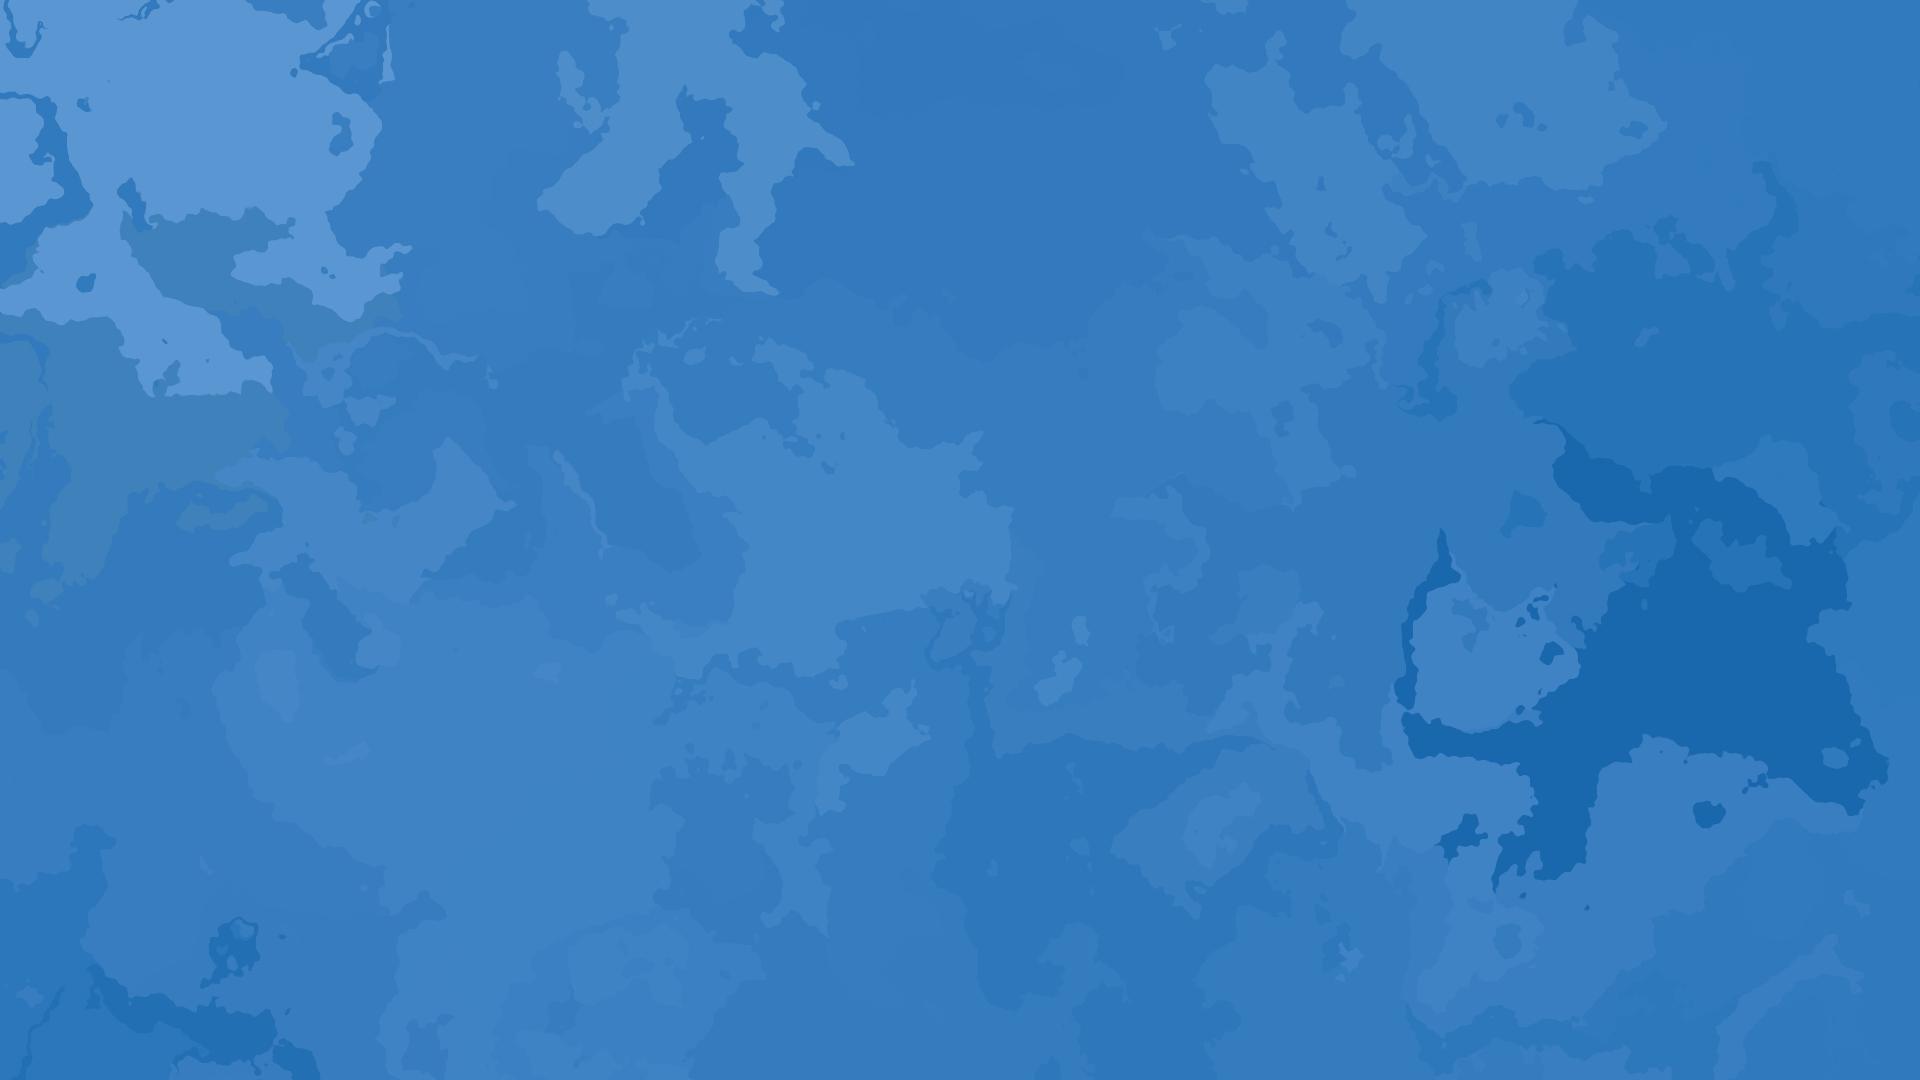 Blue Plain Wallpaper 1920x1080